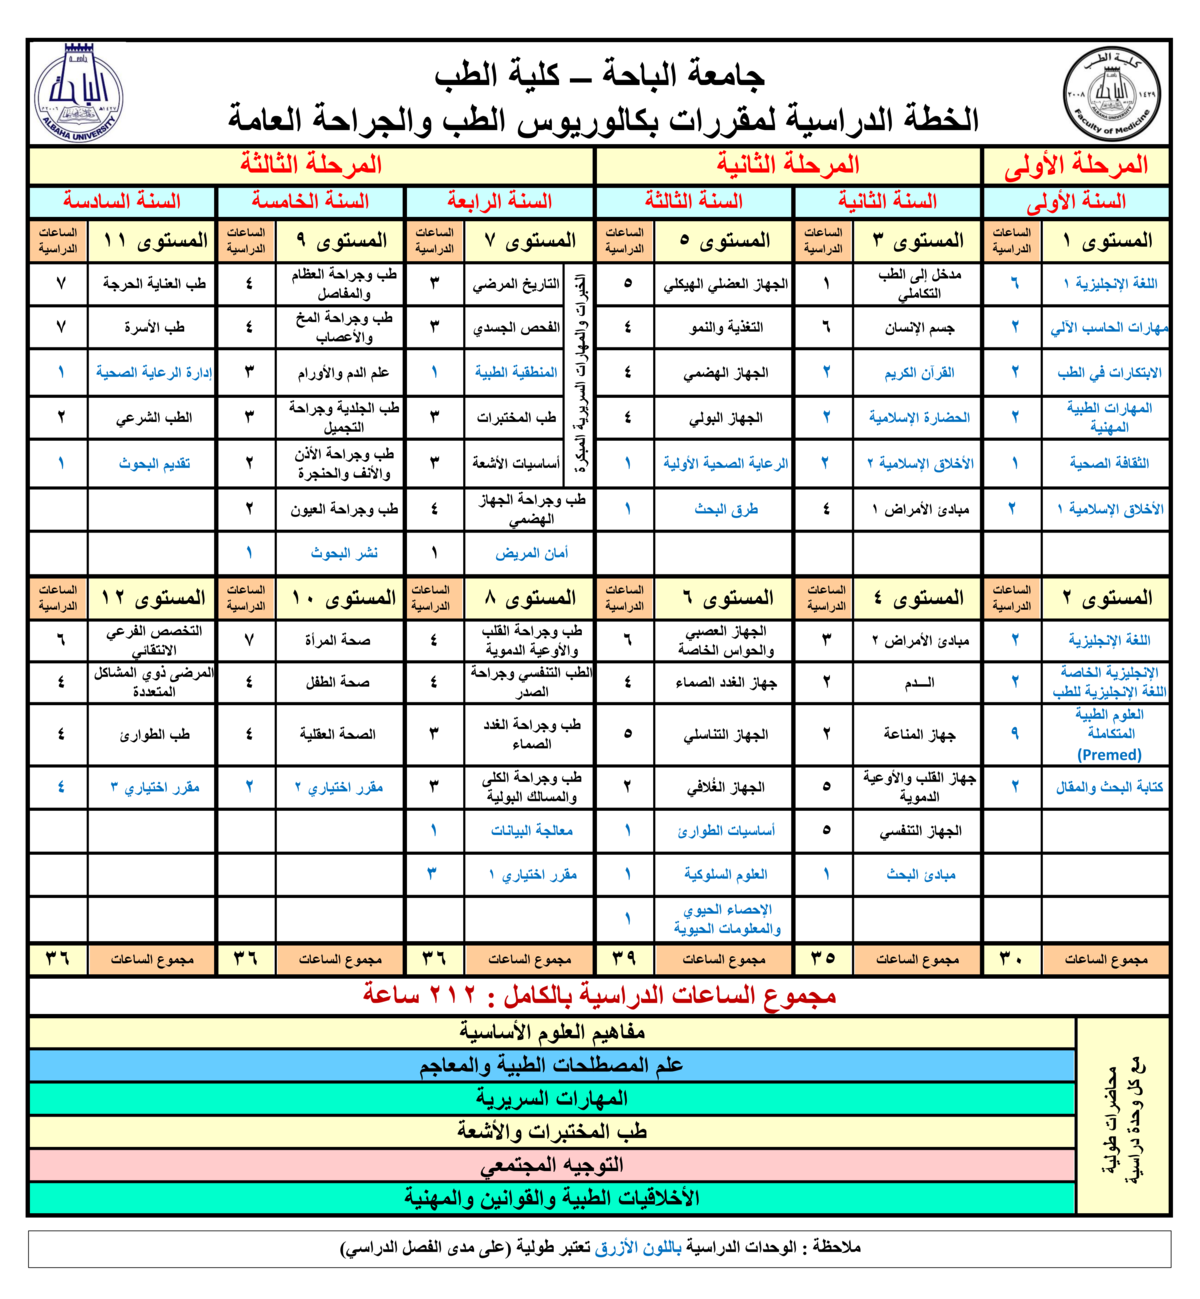 File مترجمة الخطة الدراسية في كلية الطب 0 Png Wikimedia Commons